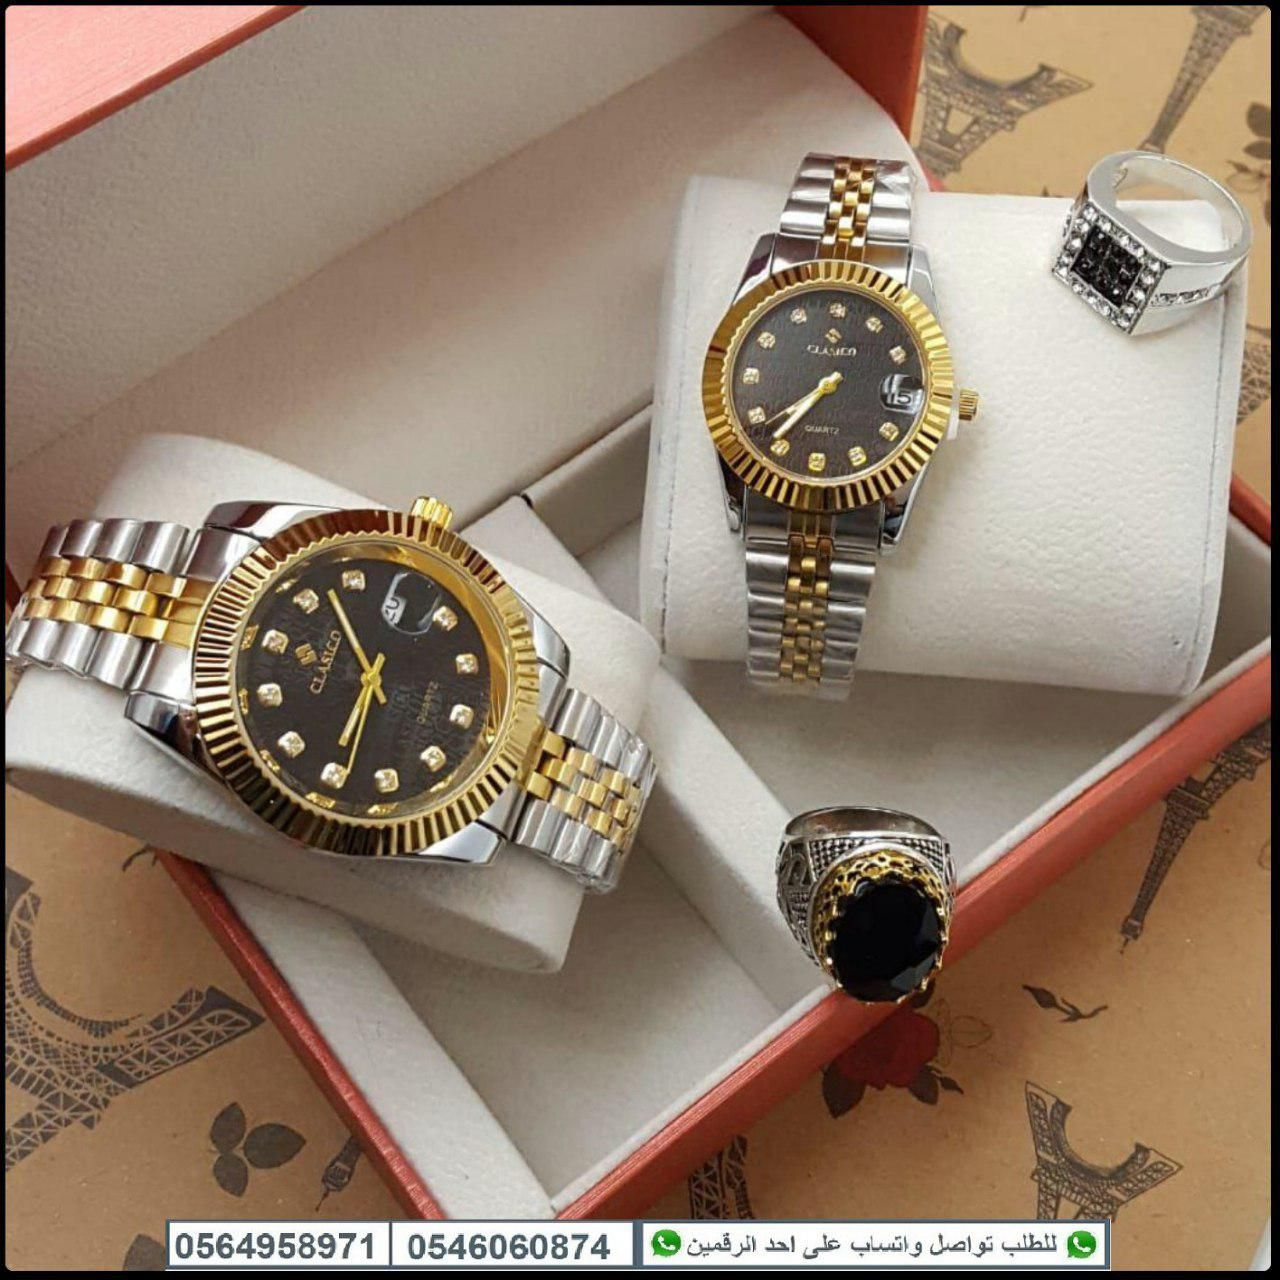 ساعات شكل رولكس رجاليه و نسائيه مع خاتم رجالي و خاتم نسائي و علبه هدايا هنوف Rolex Watches Rolex Accessories